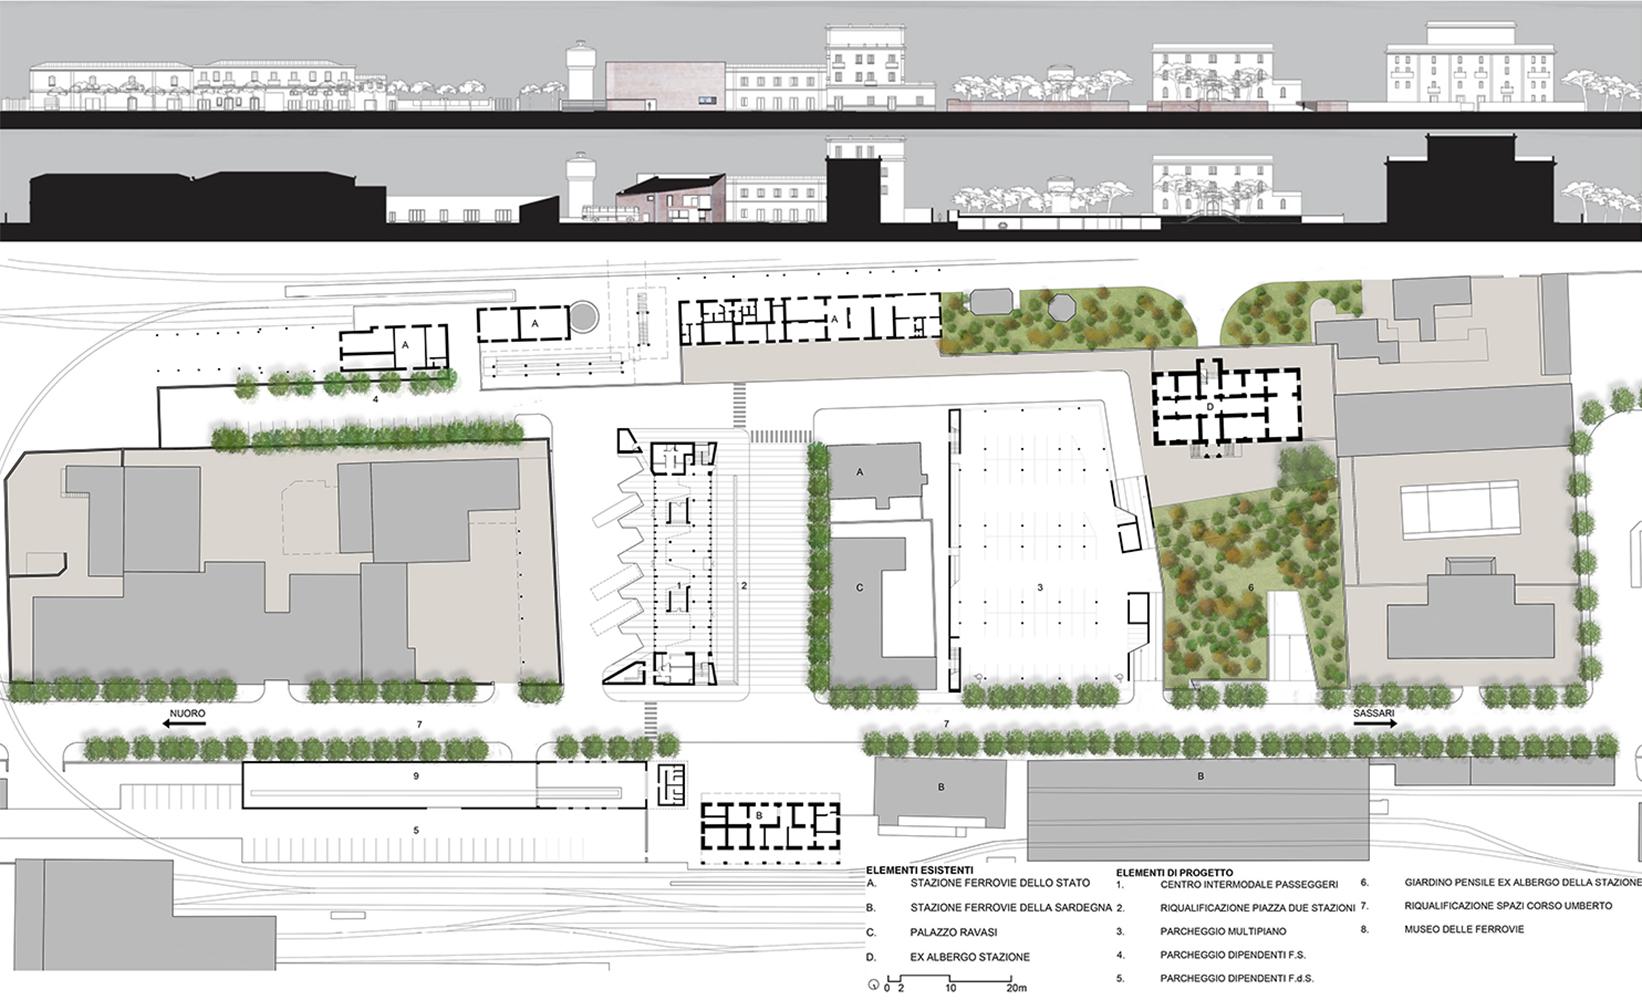 Planimetria e sezioni urbane